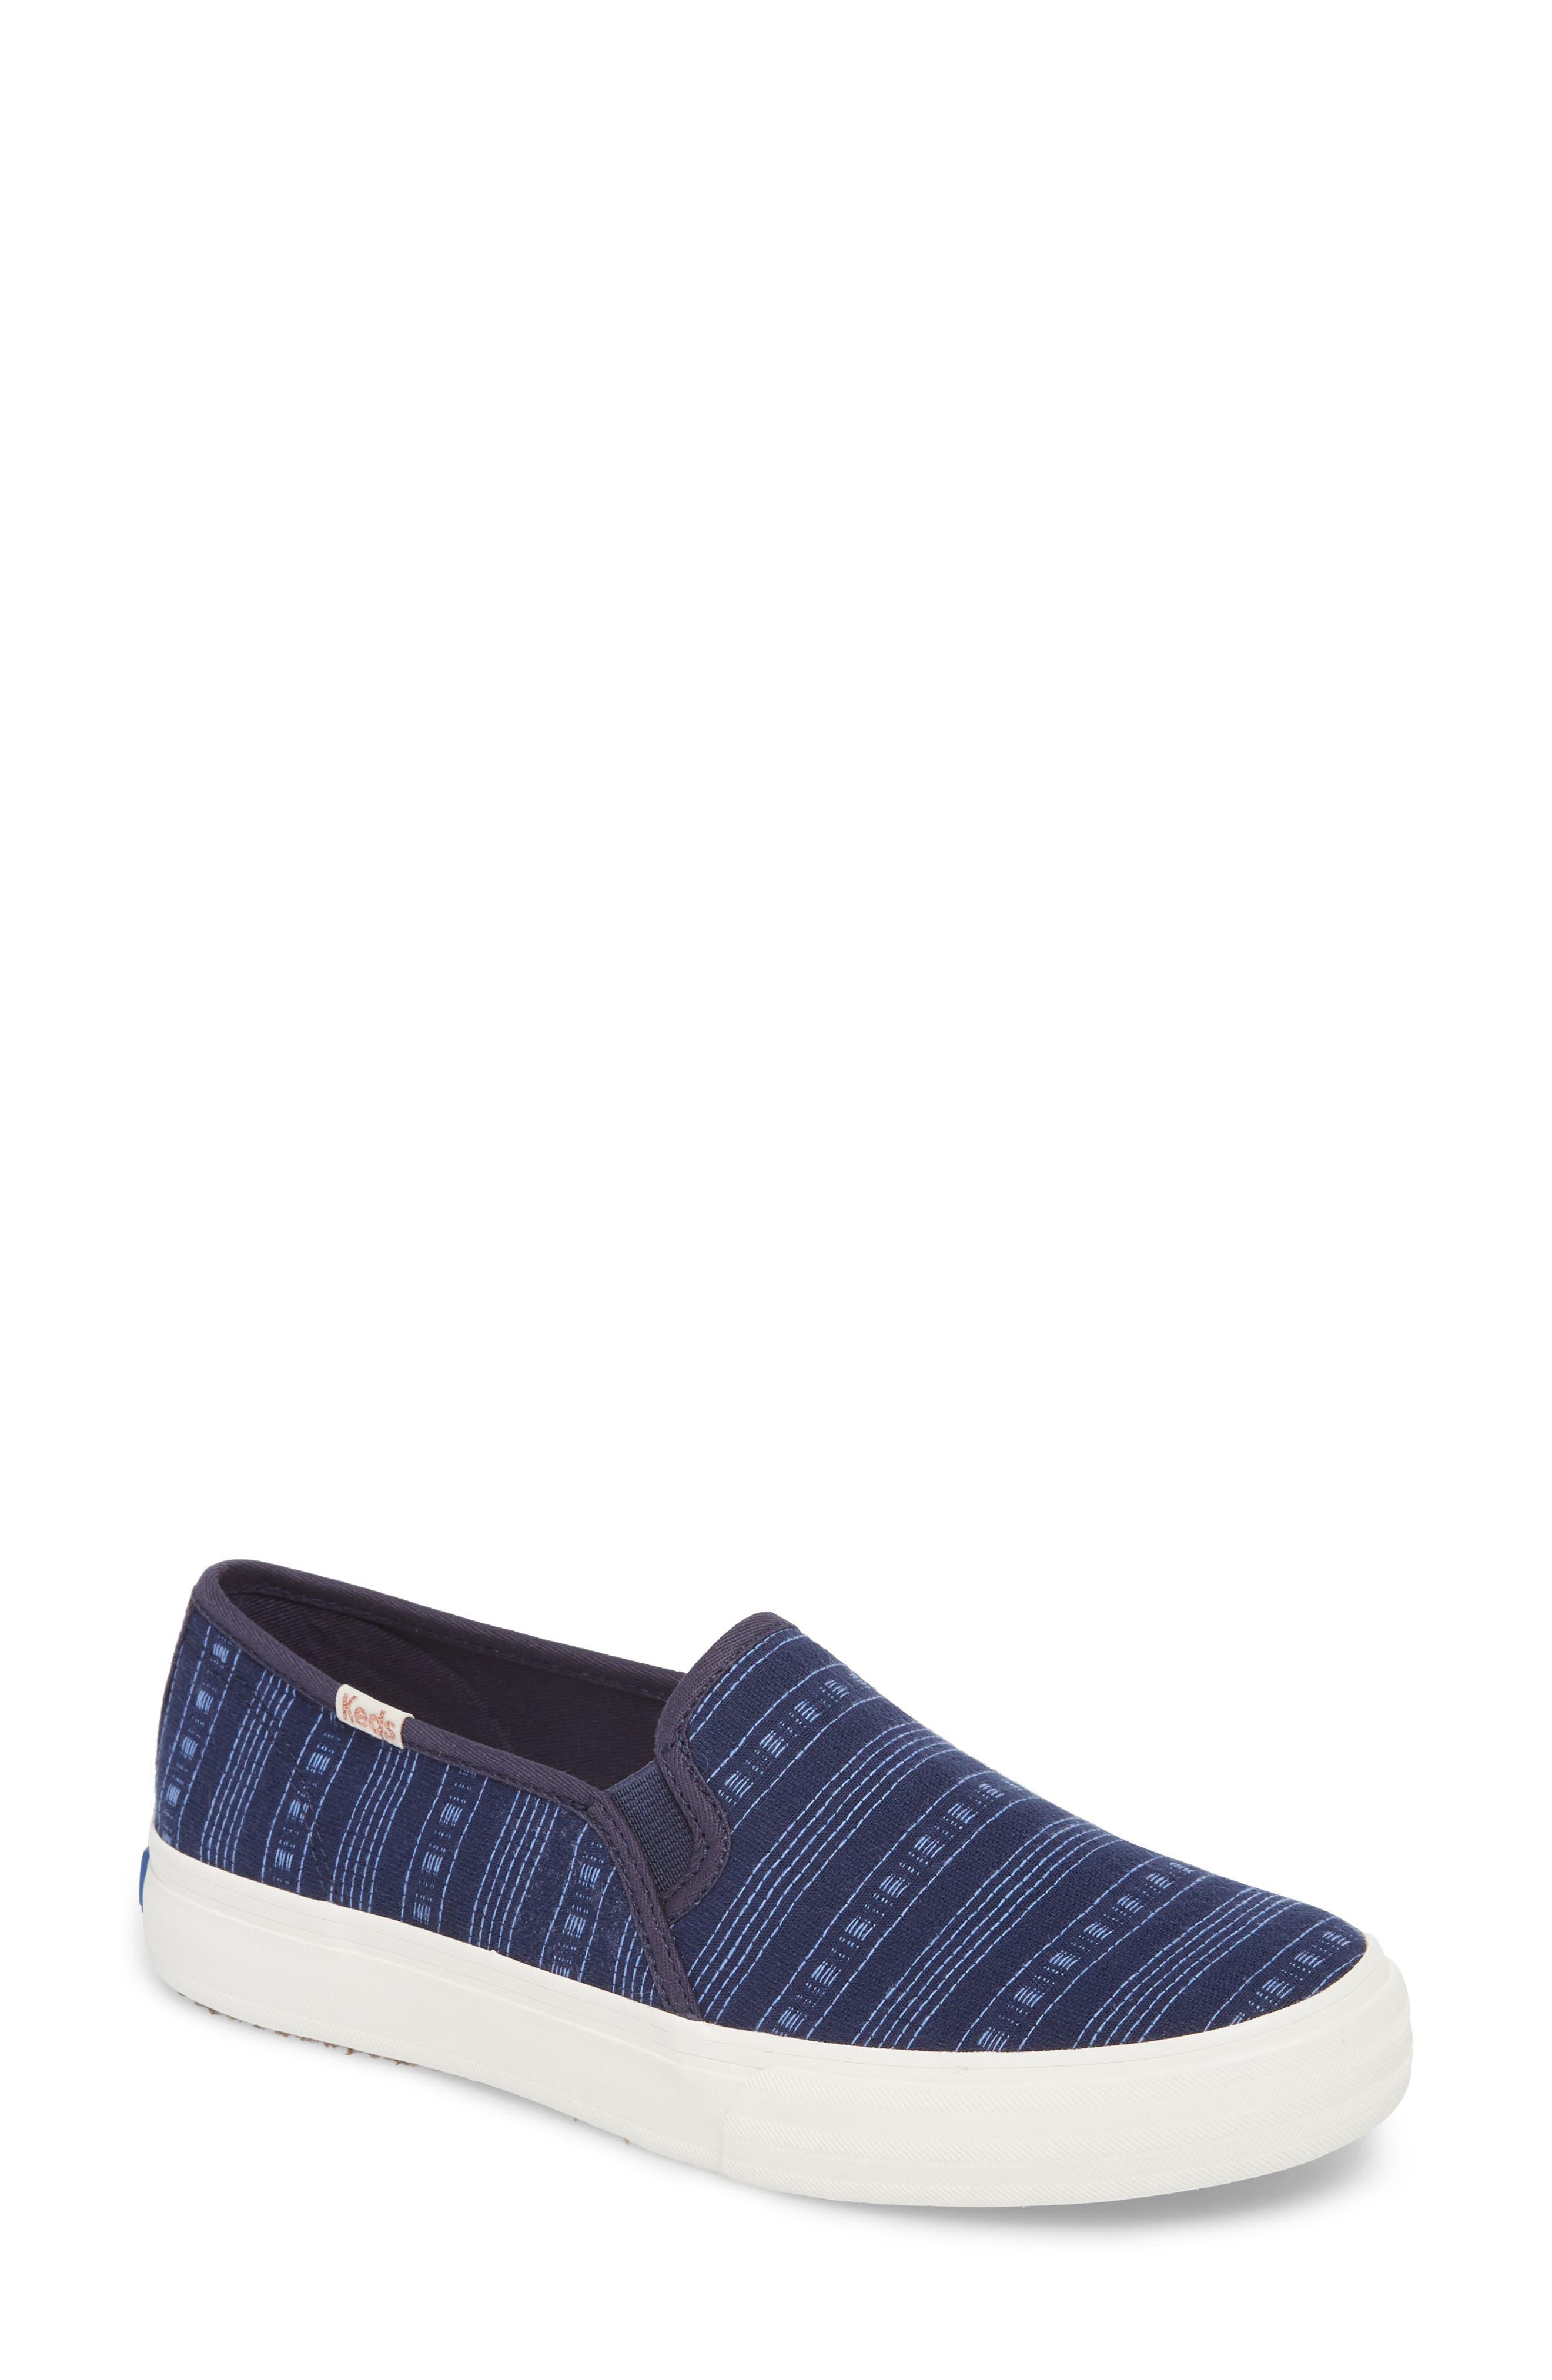 Main Image - Keds® Double Decker Summer Stripe Slip-On Sneaker (Women)